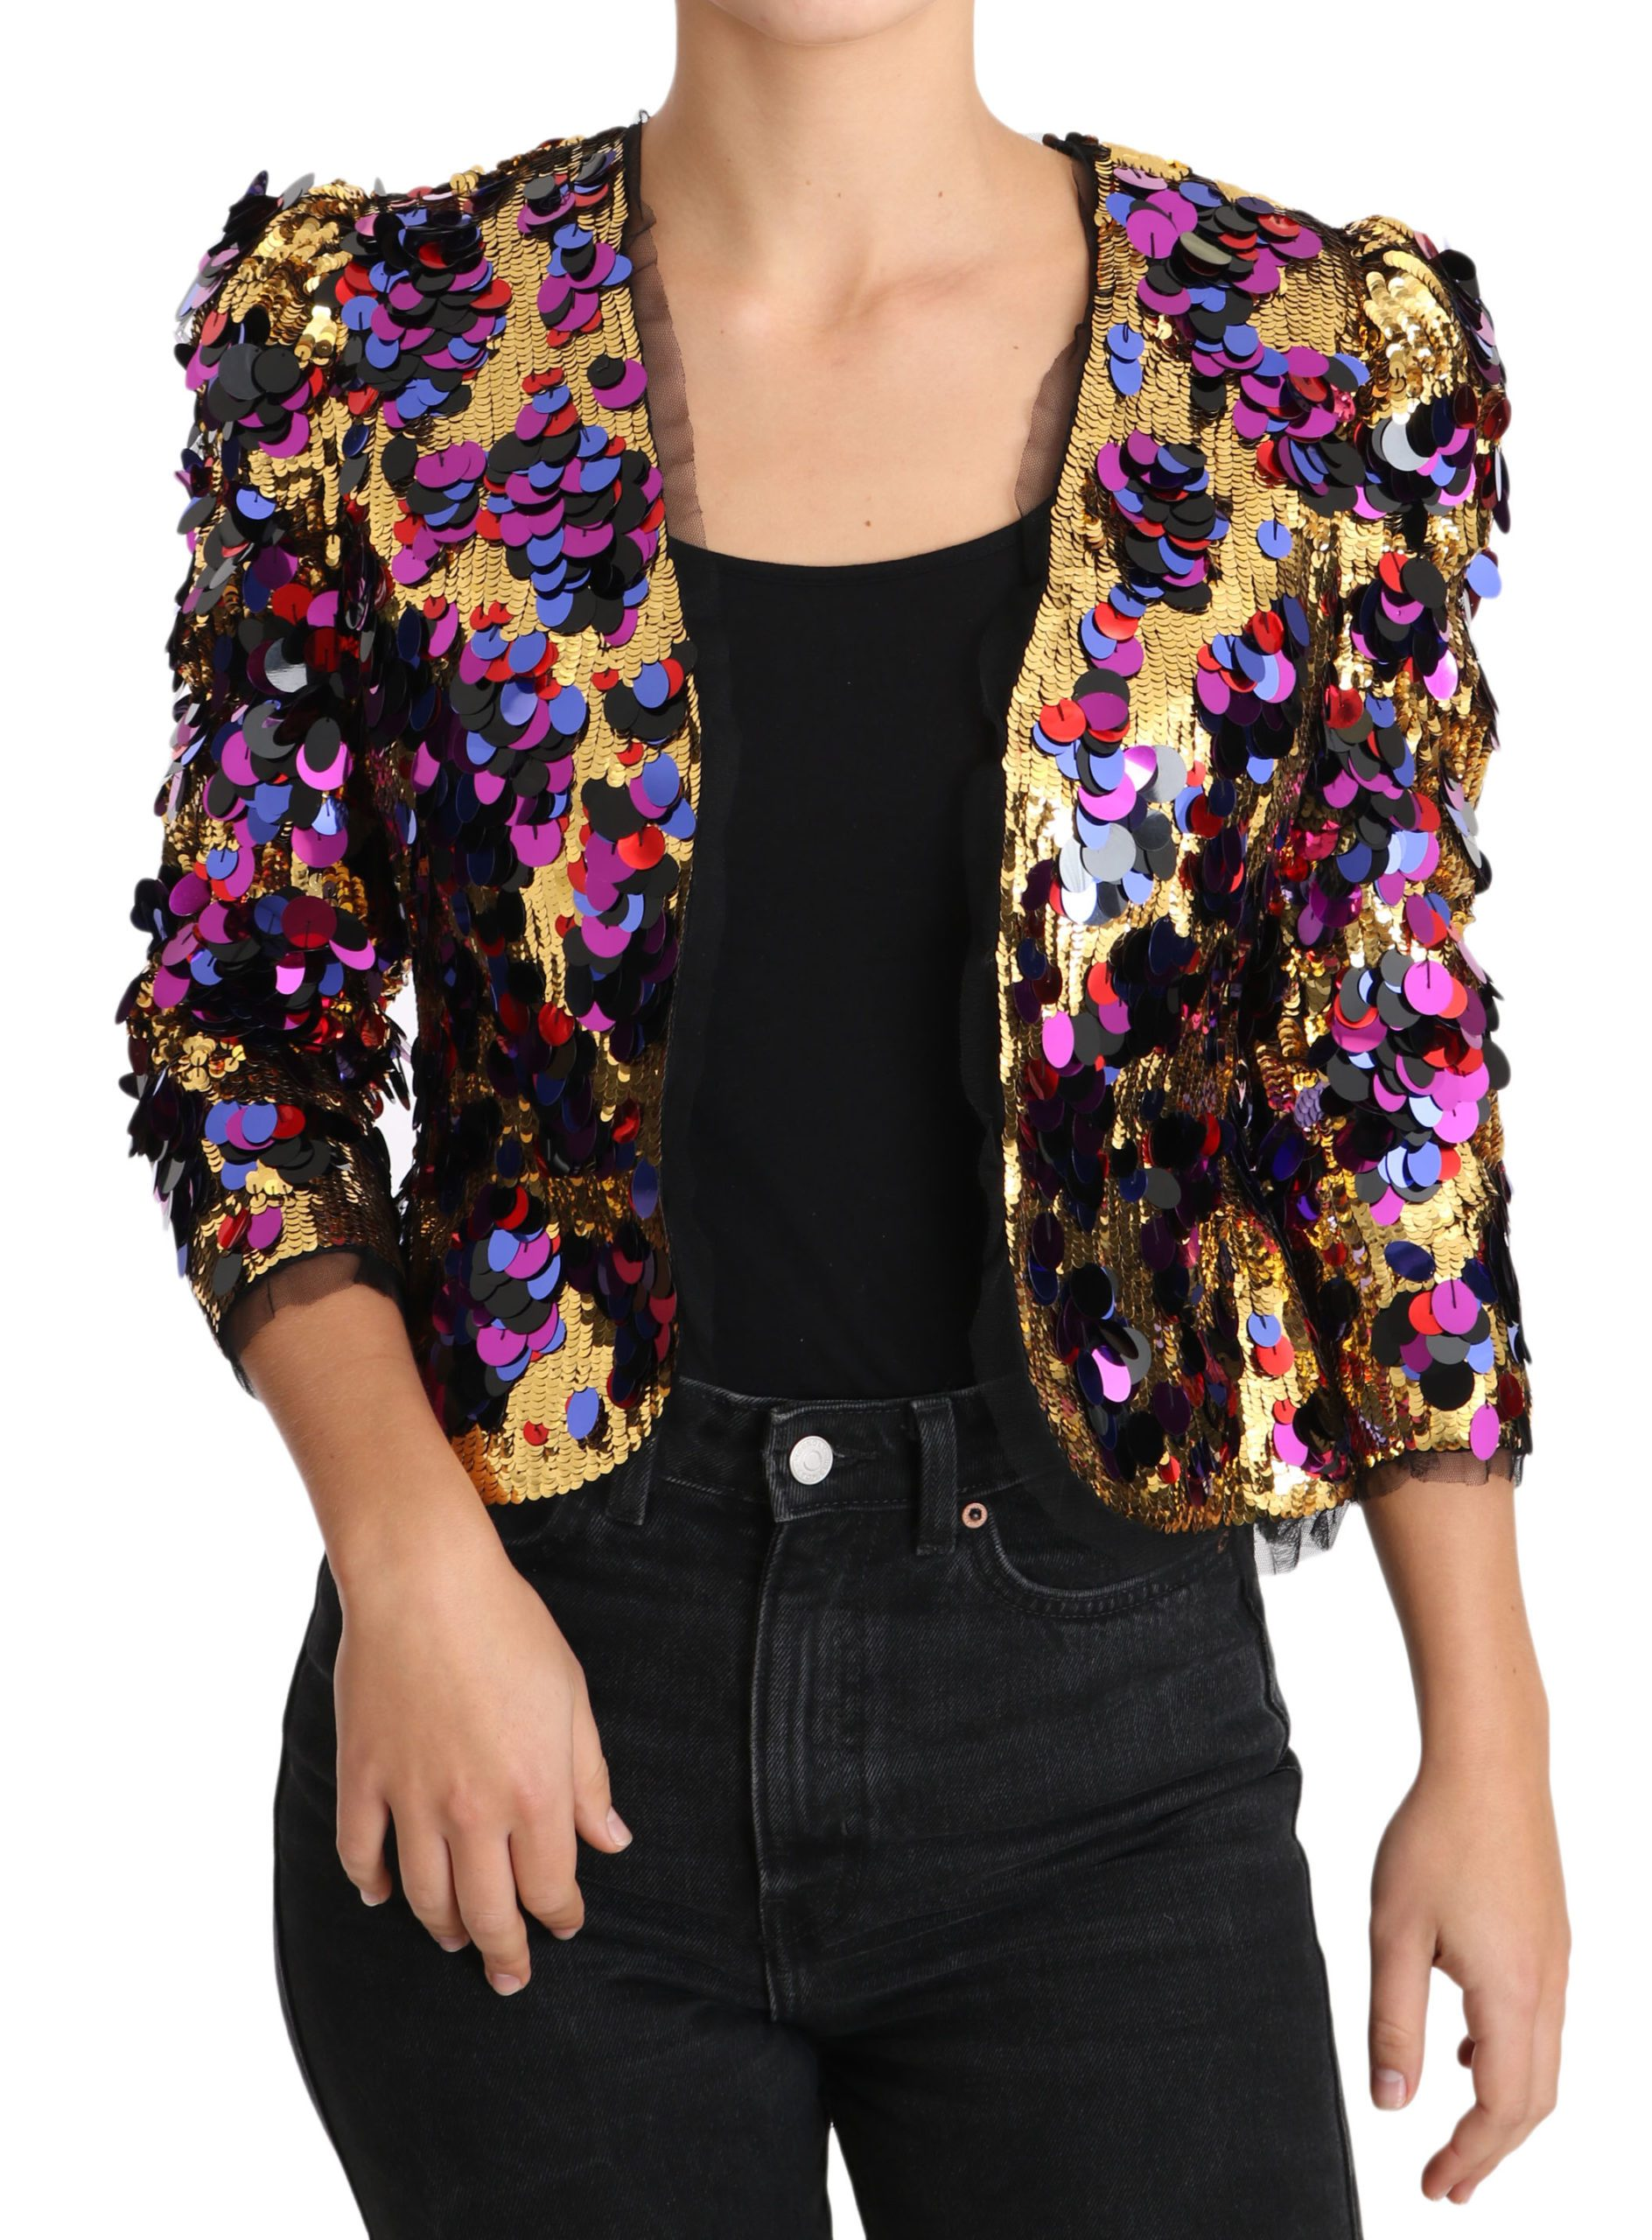 Dolce & Gabbana Women's Sequined Blazer Jacket Gold JKT2421 - IT40|S